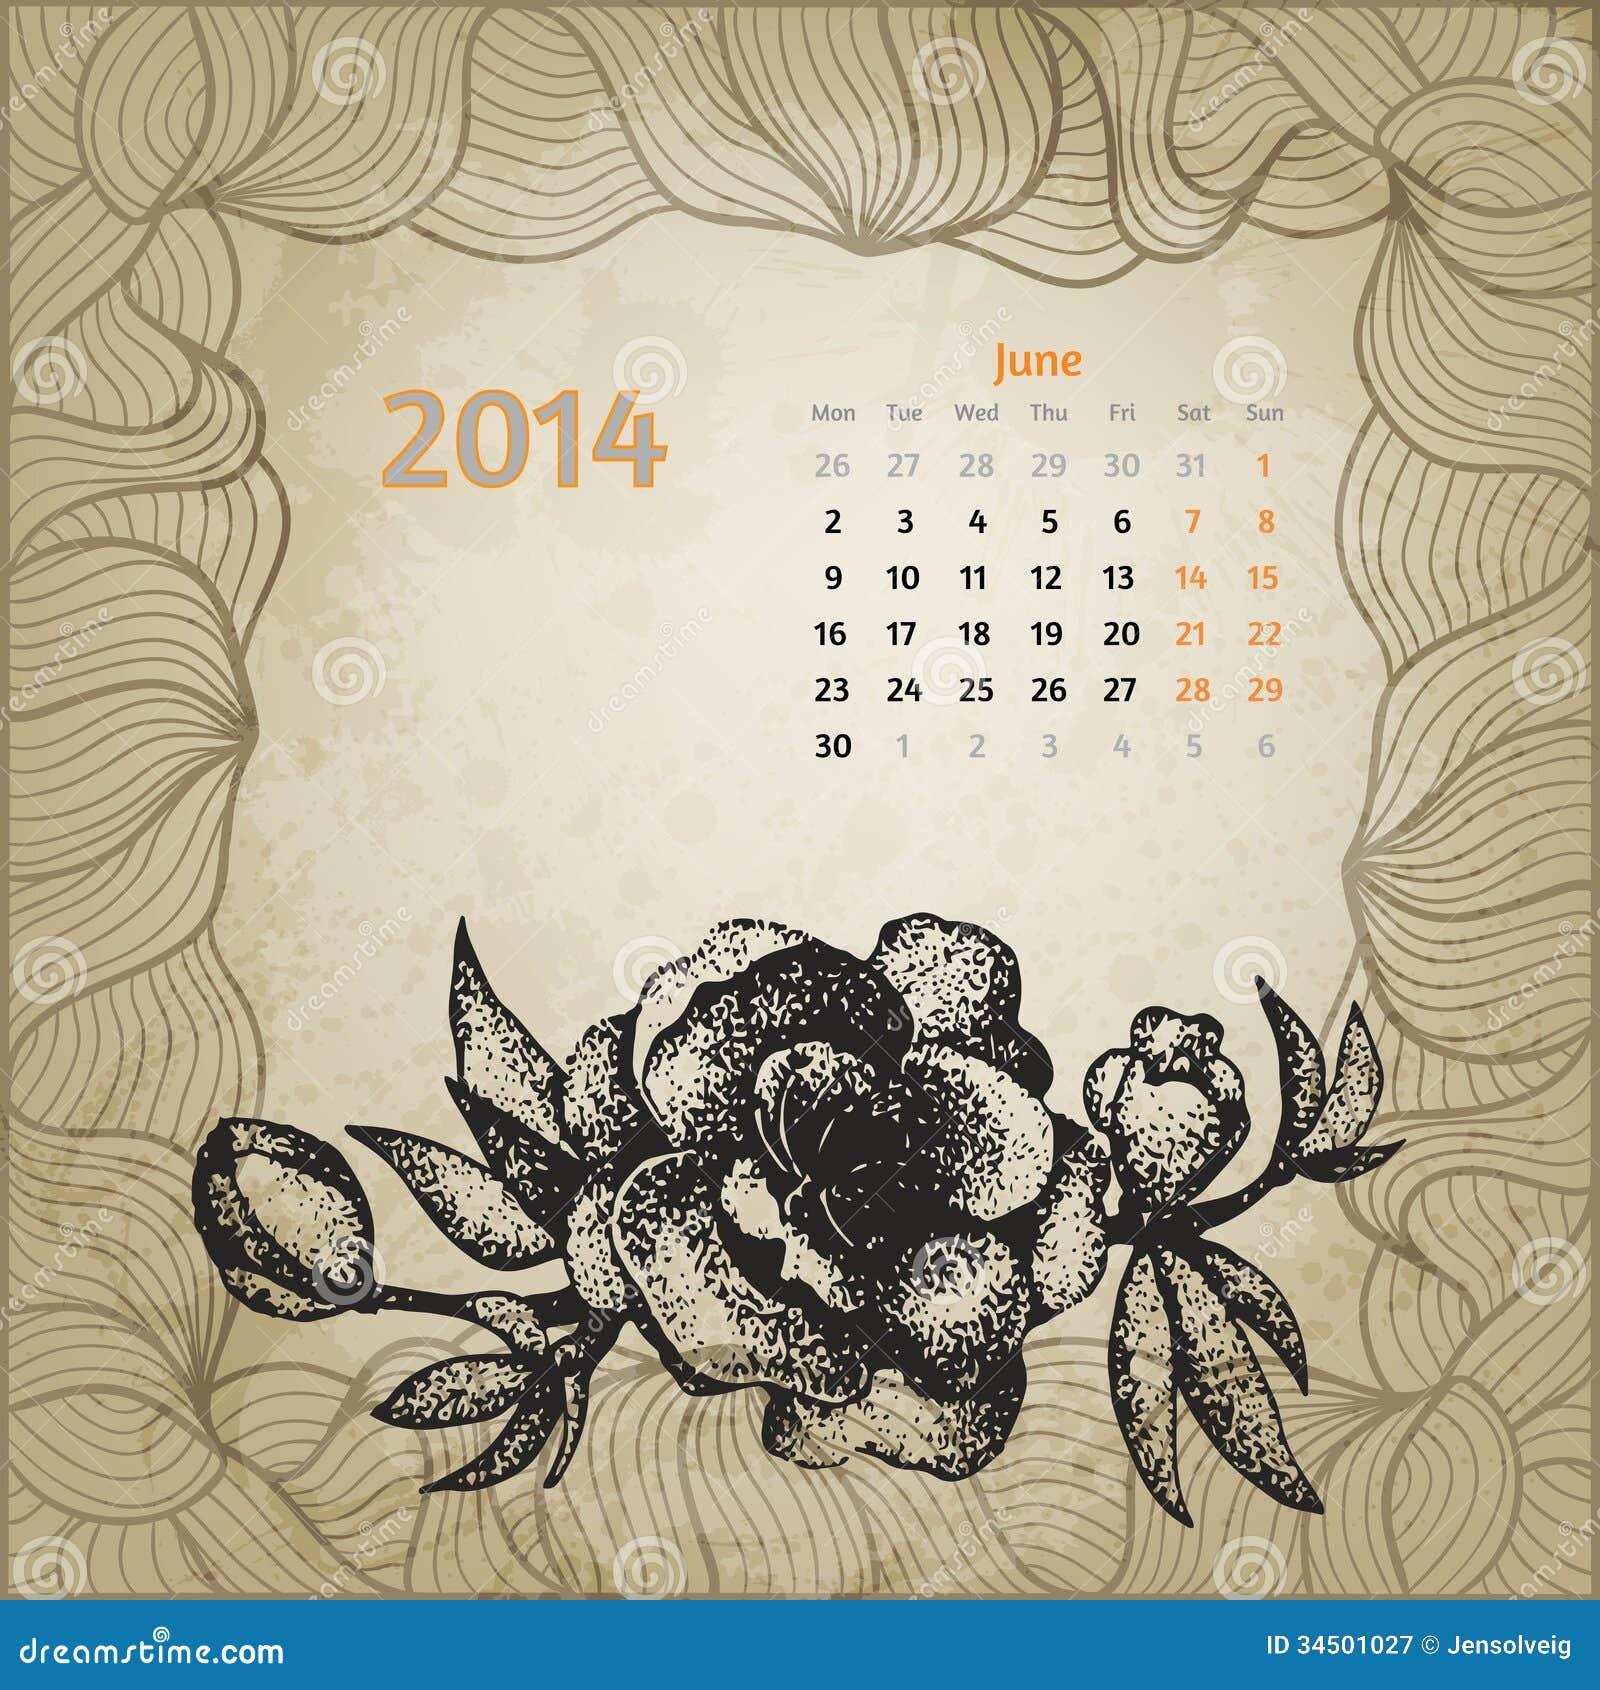 Calendario Artistico.Calendario D Annata Artistico Con La Penna Disegnata A Mano